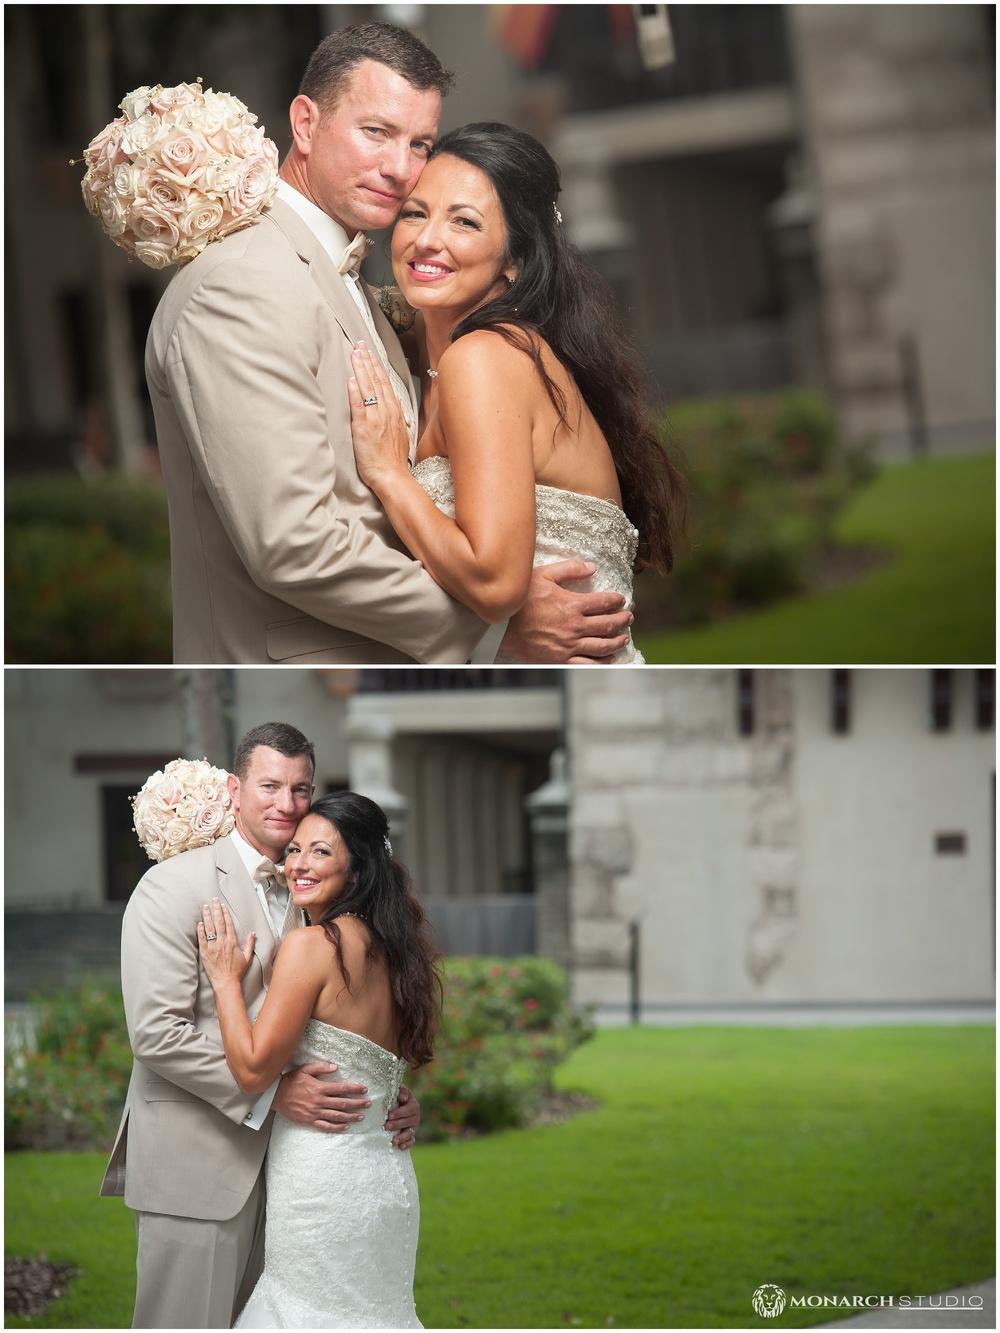 st-augustine-photographer-casa-monica-wedding-064.jpg